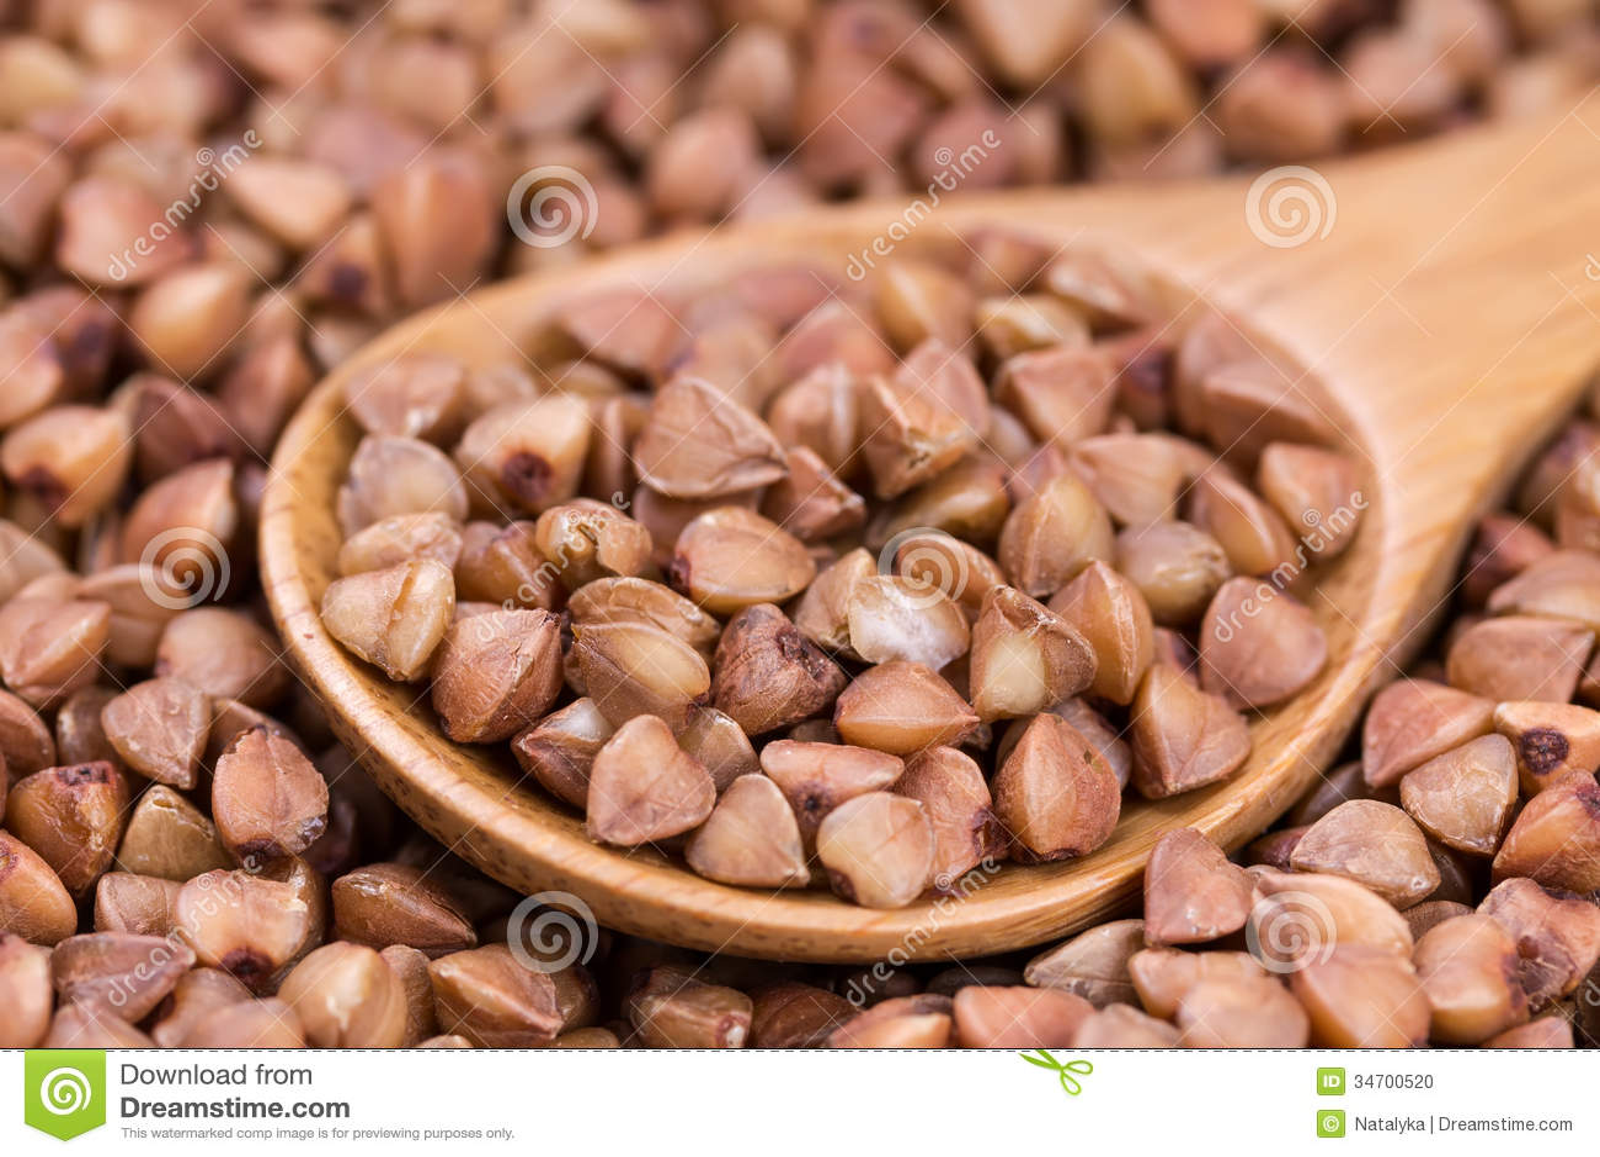 how to make buckwheat flour from groats